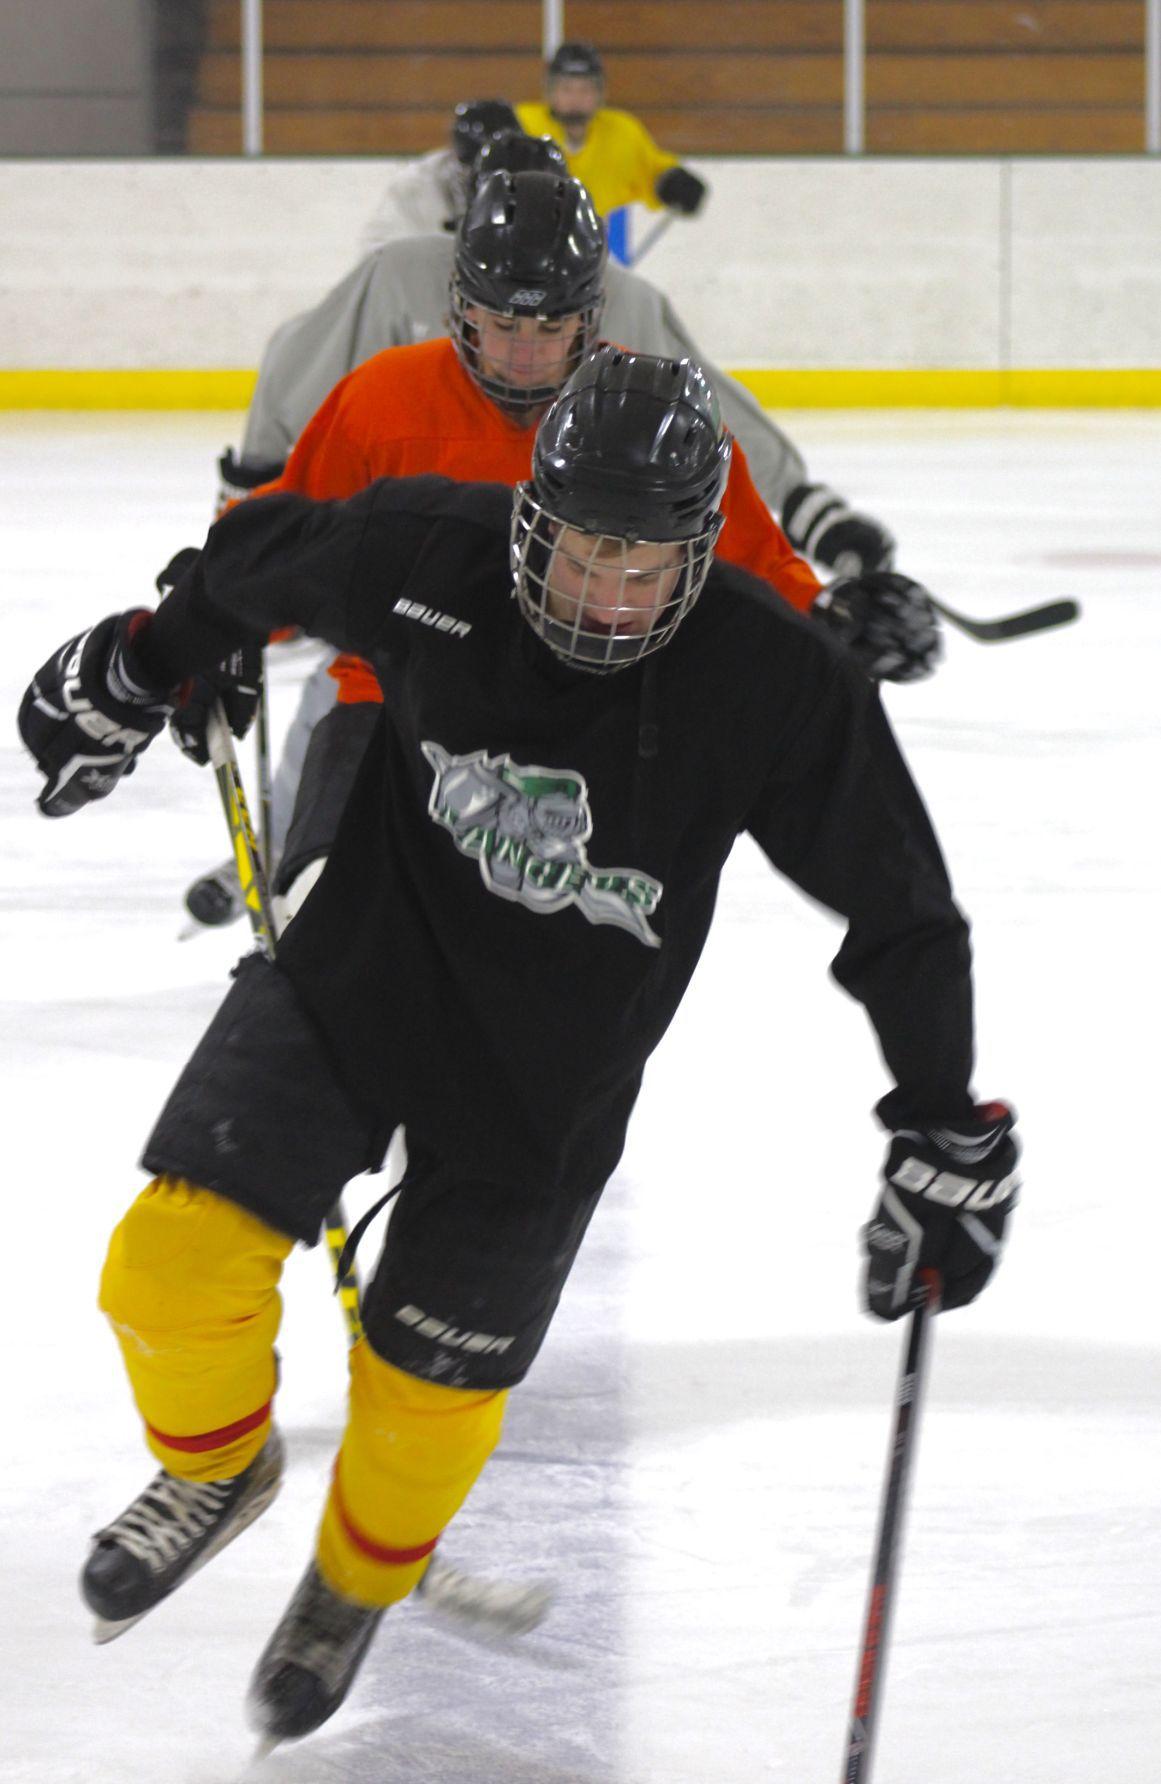 La Crescent High School hockey first practice